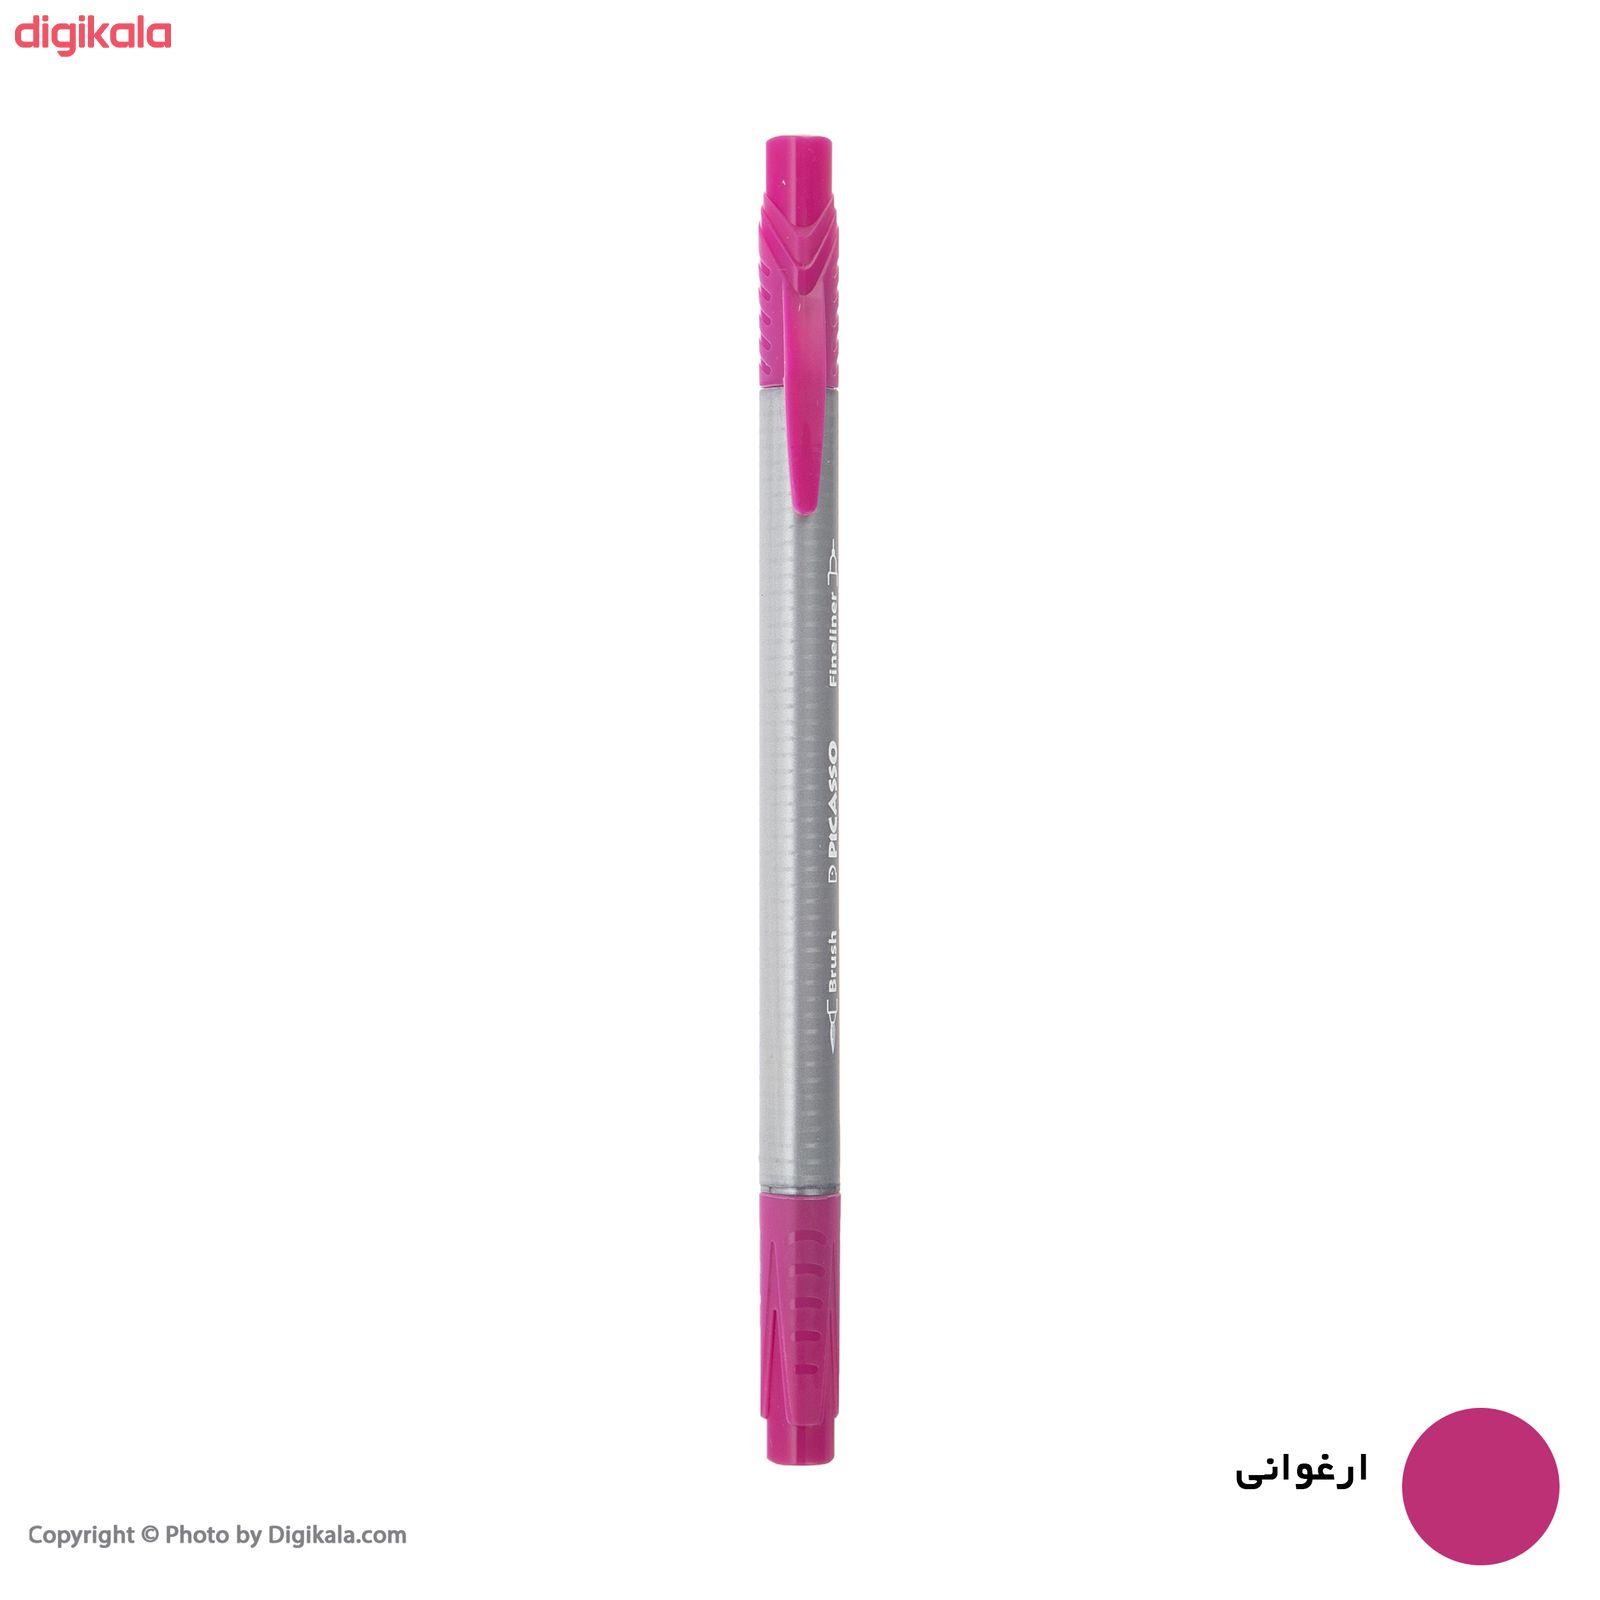 روان نویس پیکاسو مدل Brush Marker Fine Liner main 1 14